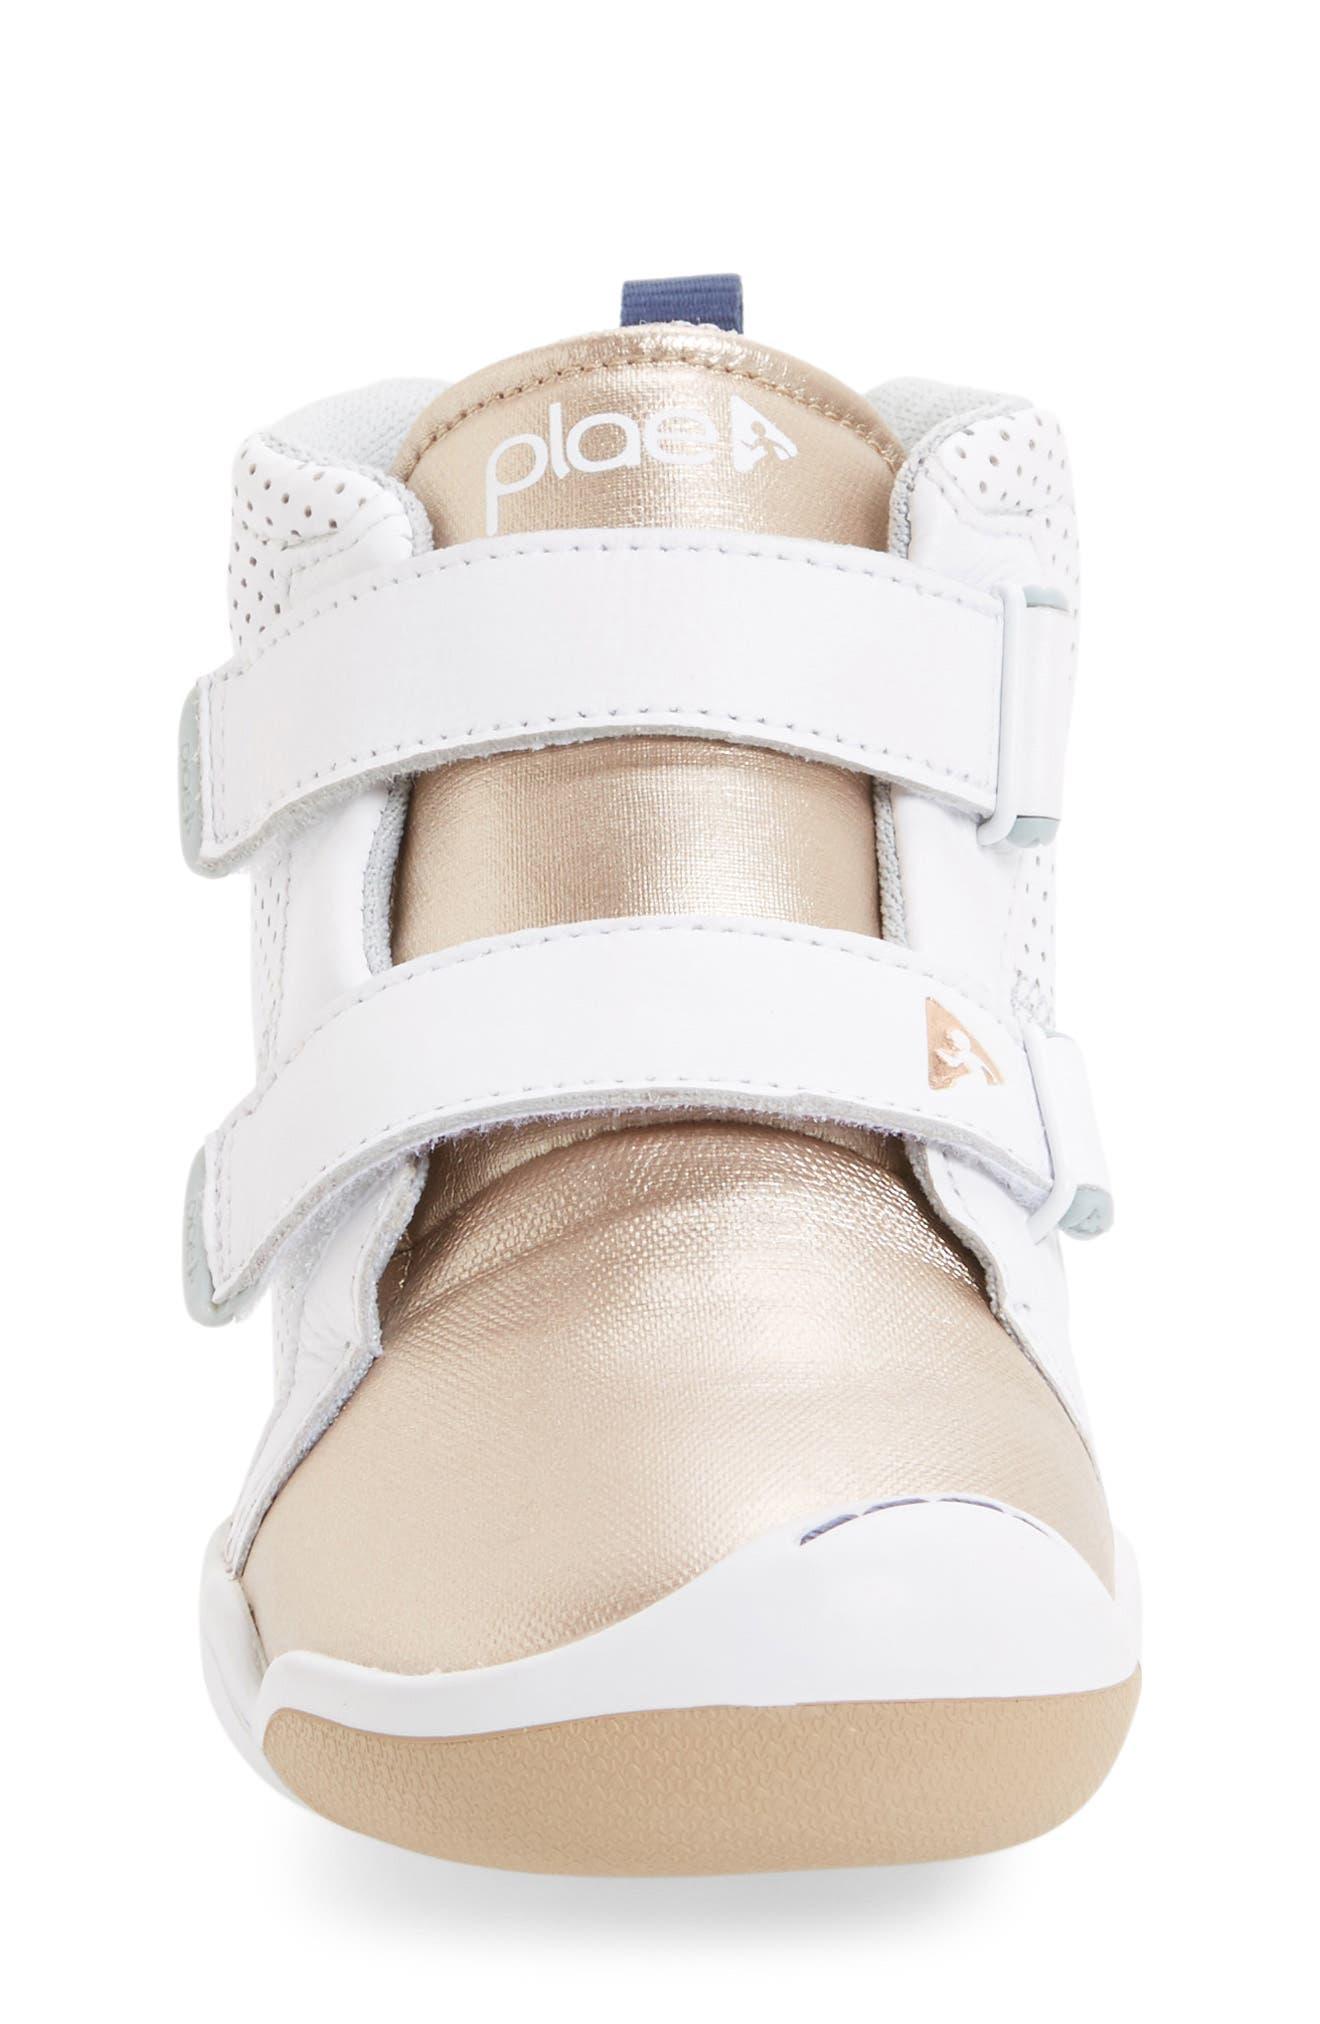 Max Customizable High Top Sneaker,                             Alternate thumbnail 3, color,                             710